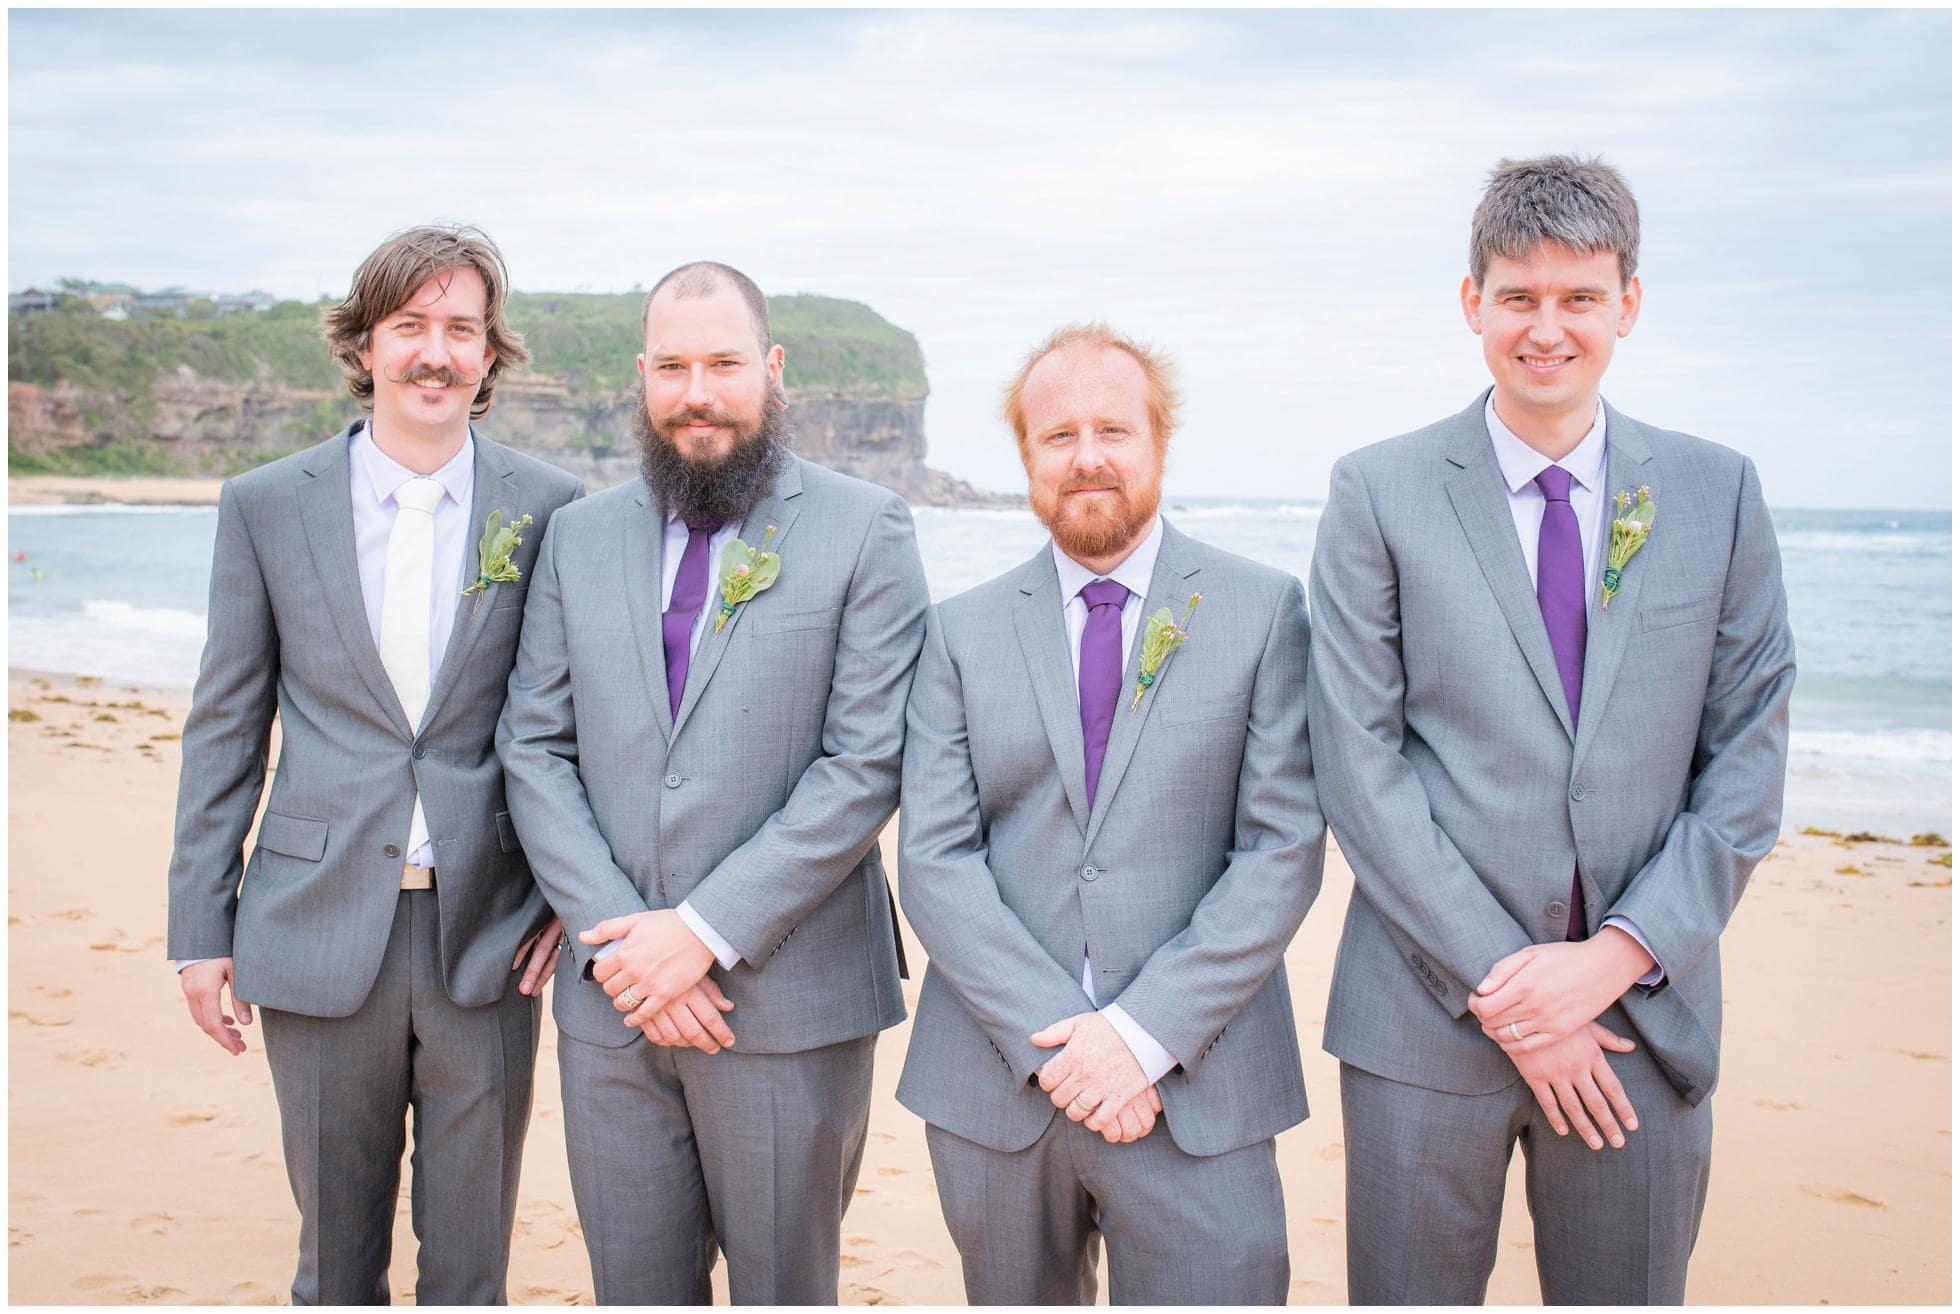 Groomsmen looking cool on the beach despite wearing warm suits